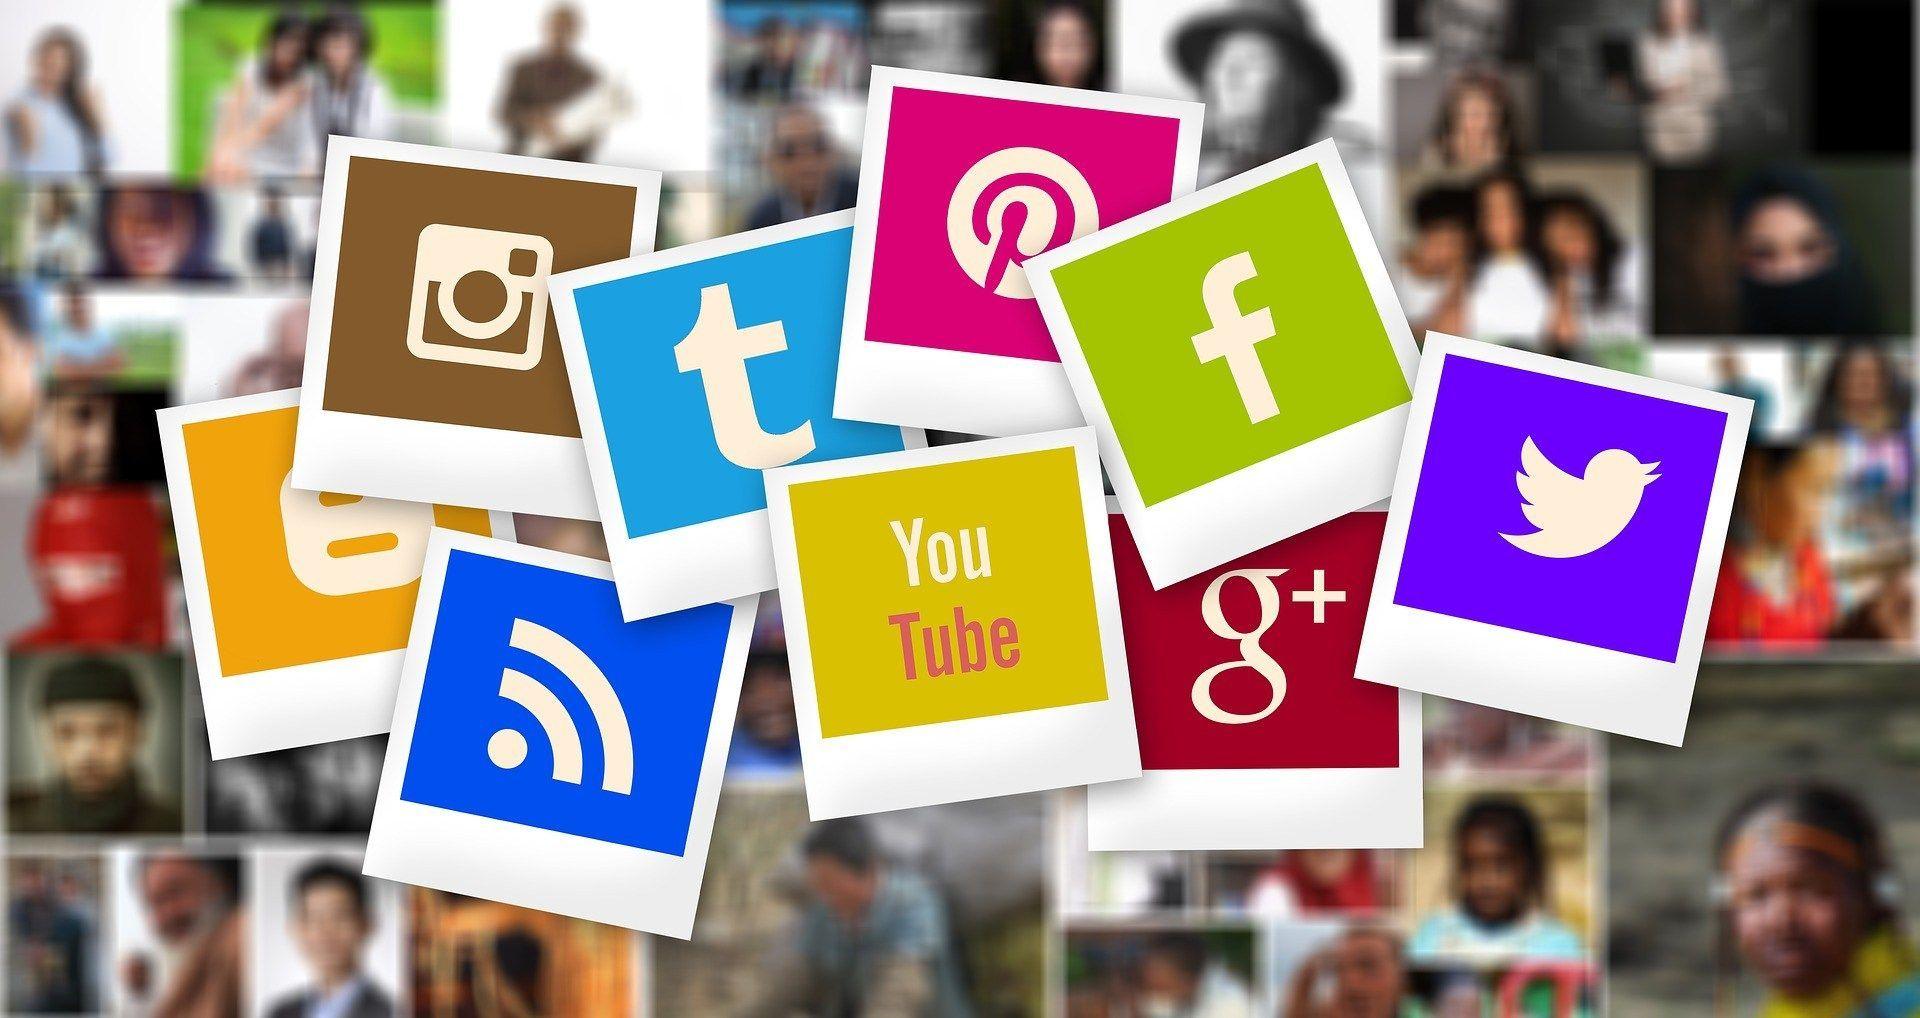 5 Tips To Improve Your Social Media Posts Social Media Explorer Marketing Strategy Social Media Social Media Marketing Social Media Optimization